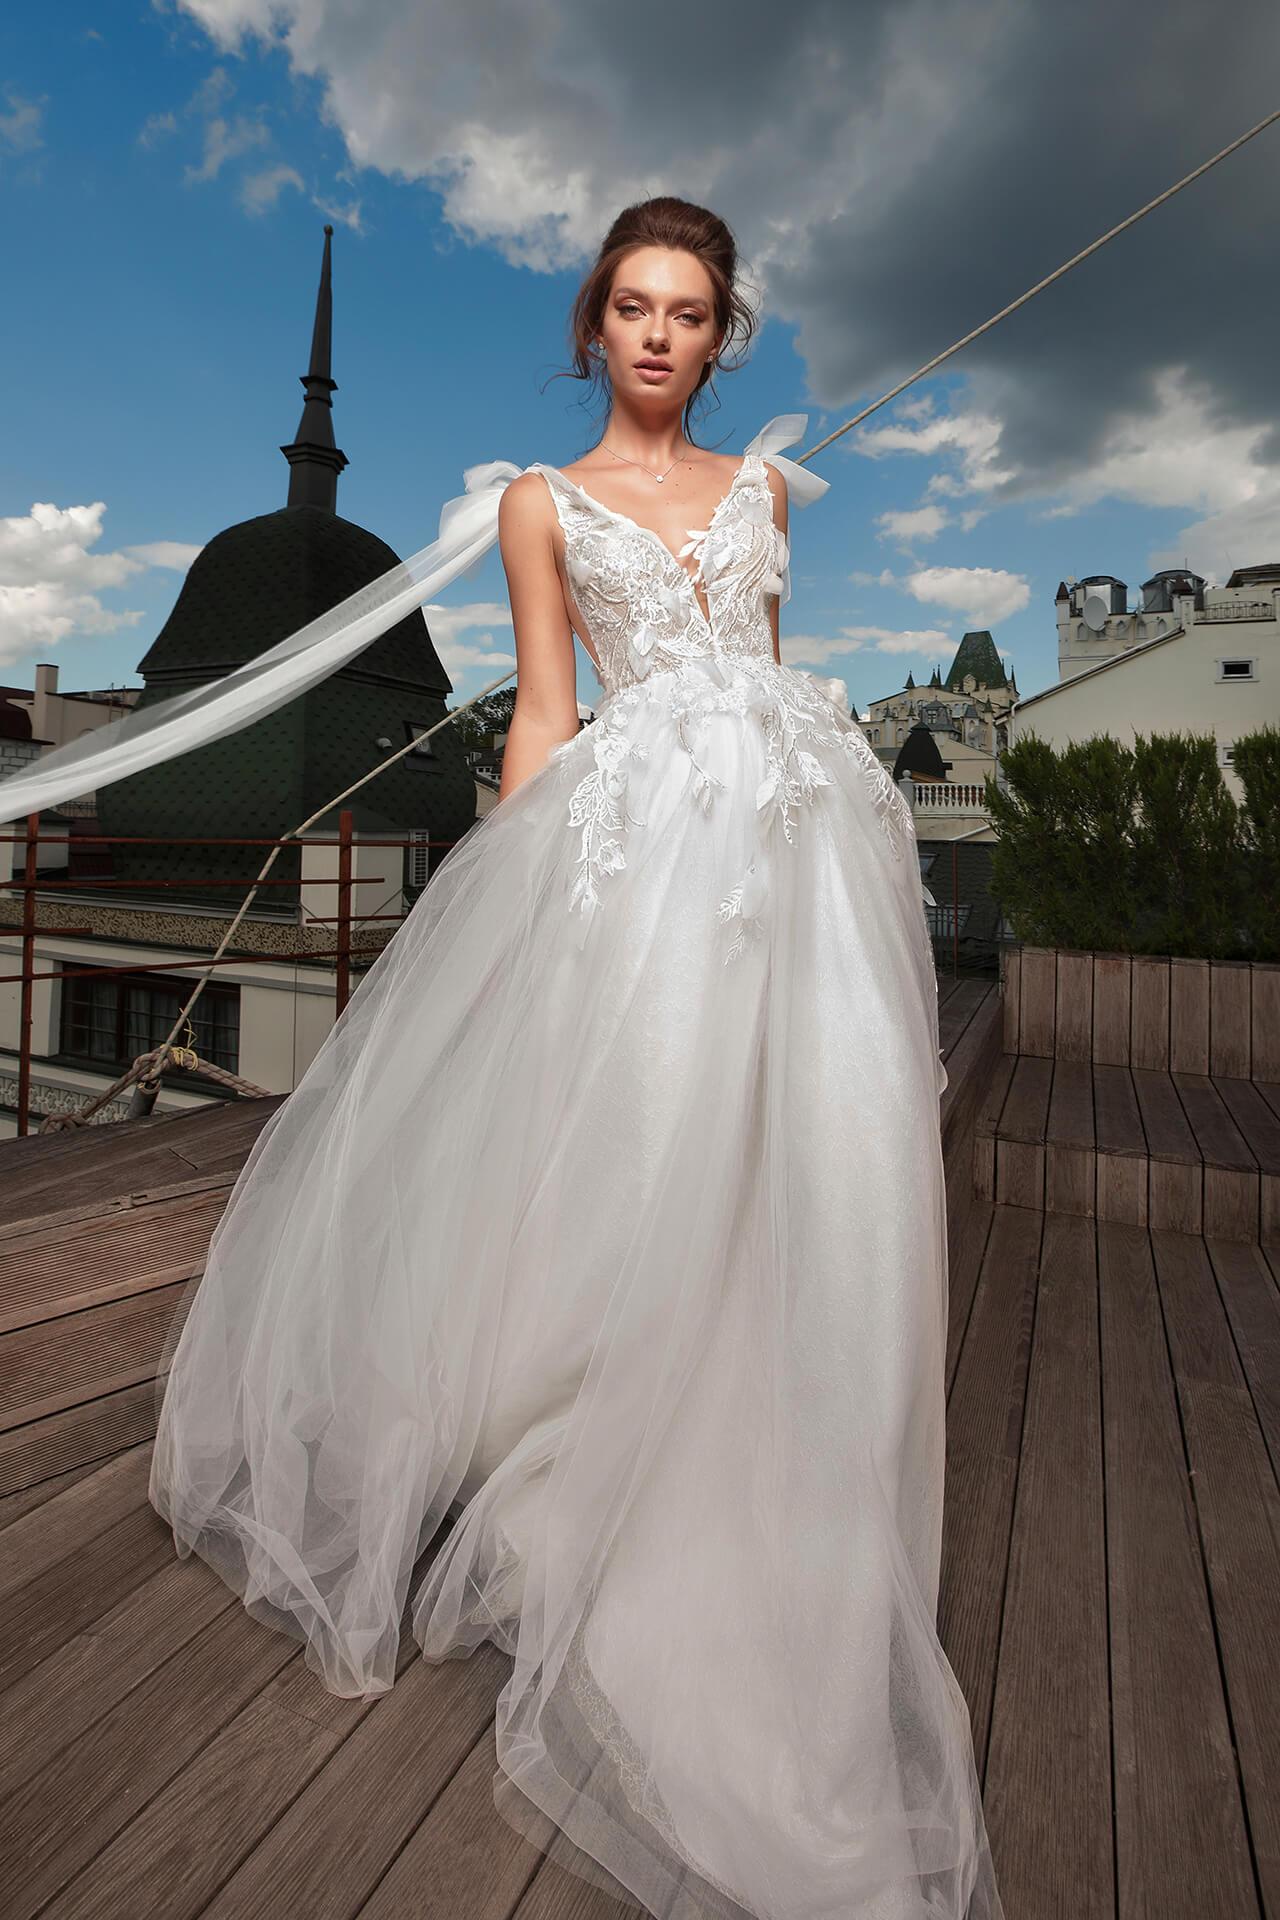 Свадебное платье Michelina, Коллекция Cloudy dreams, Anne-Mariée